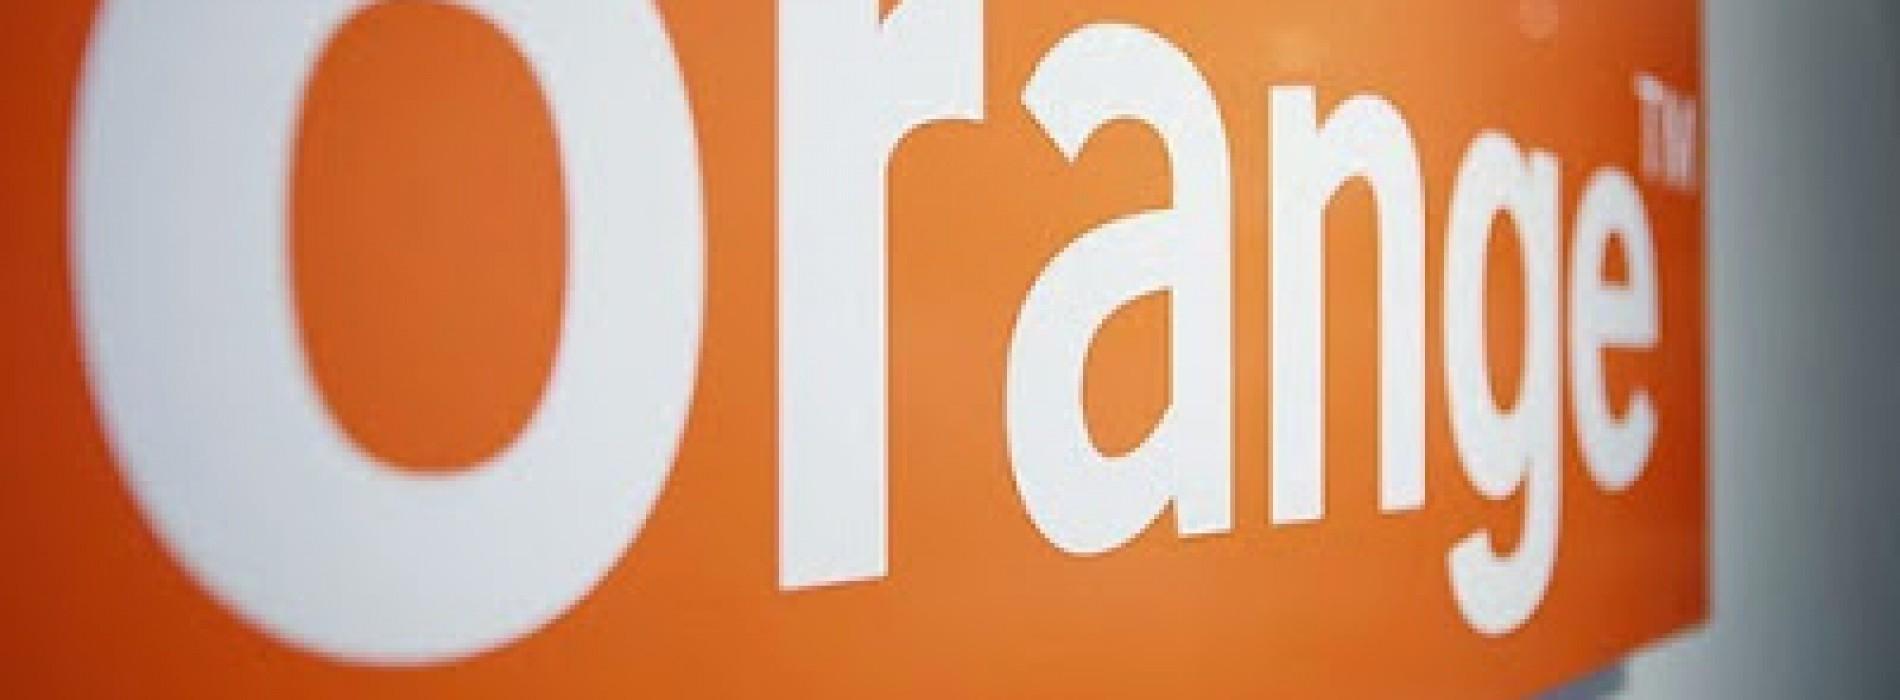 Orange e Engie, una nuova partnership per l'energia in Africa